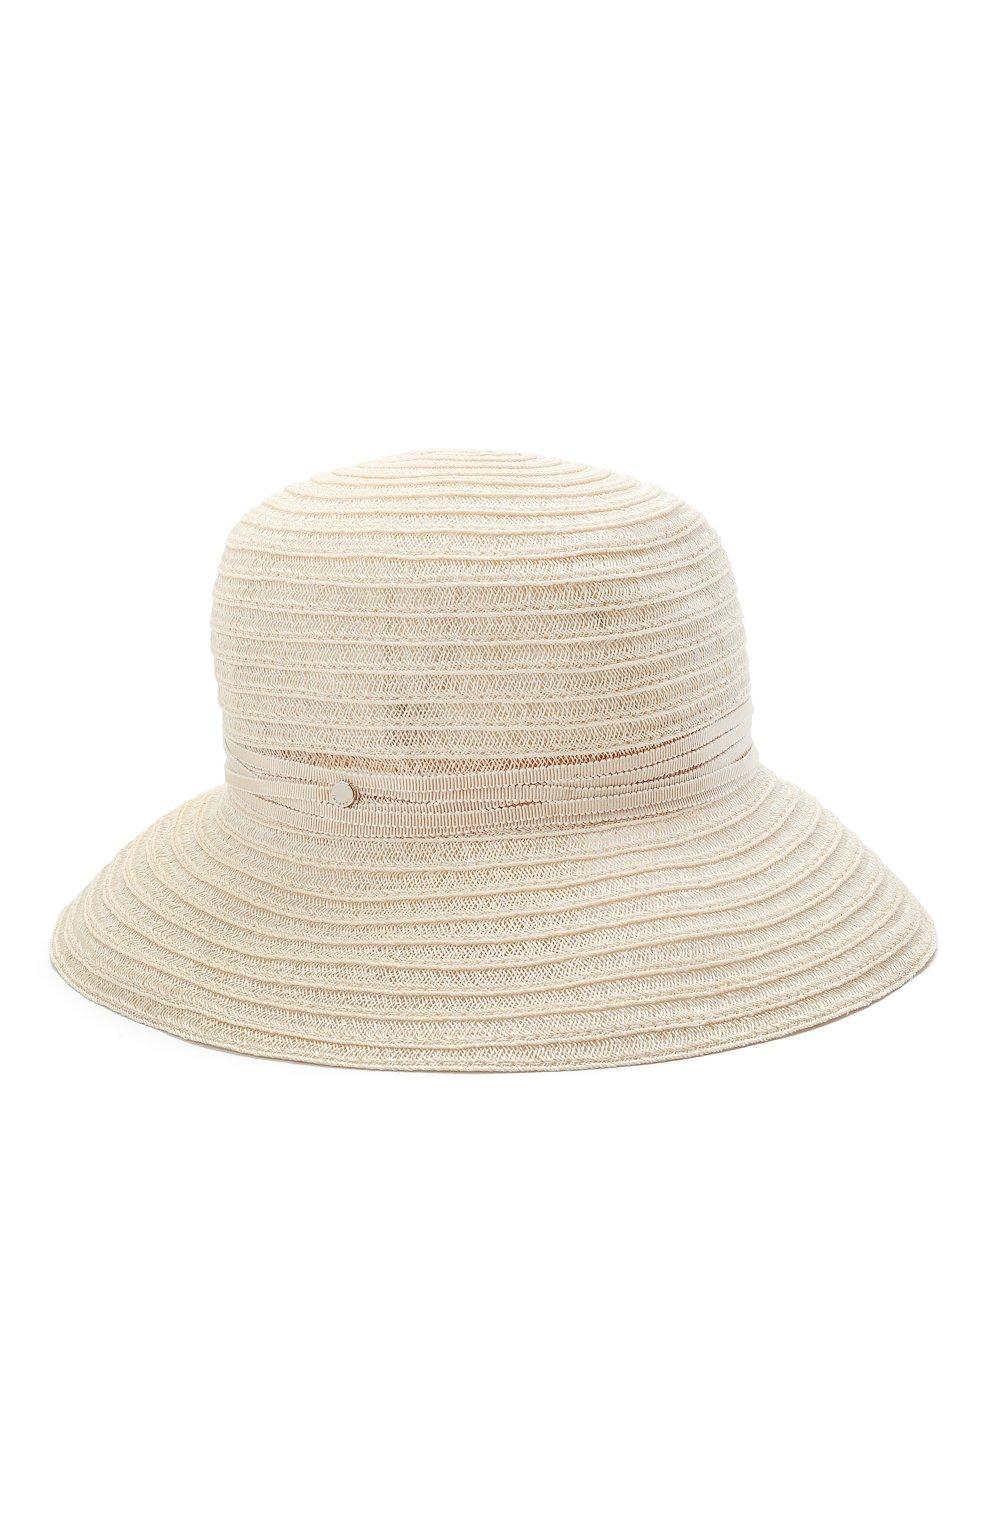 Женская шляпа INVERNI бежевого цвета, арт. 5197 CC | Фото 1